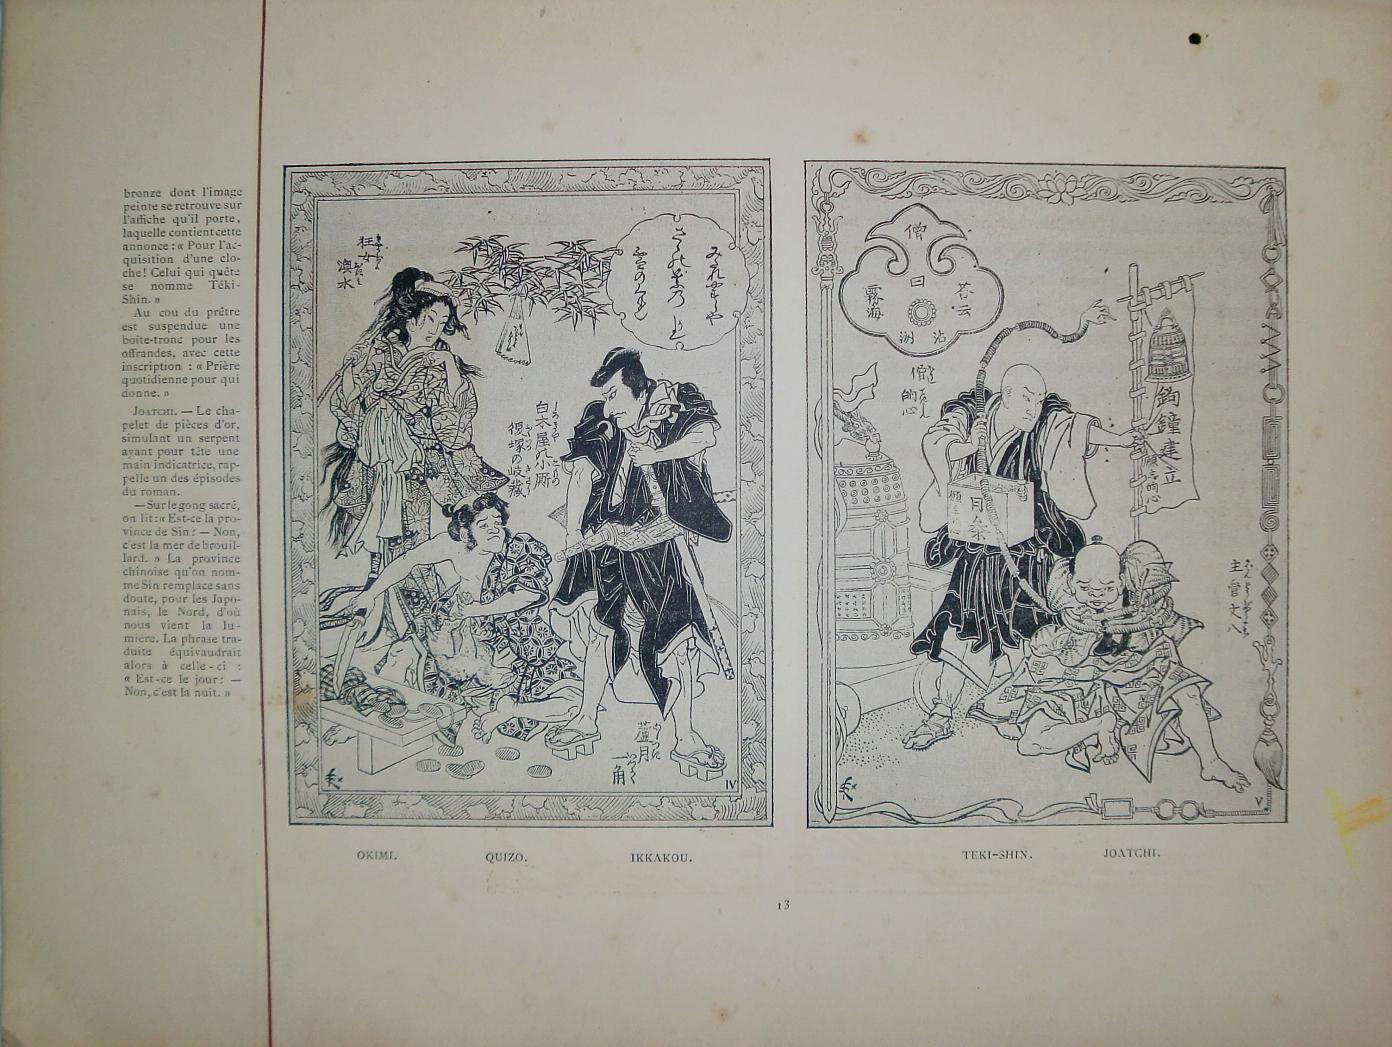 お駒 OKOMA roman japonais illustré,  d'après le texte de Takizawa-Bakin et les dessins de Chiguenoï